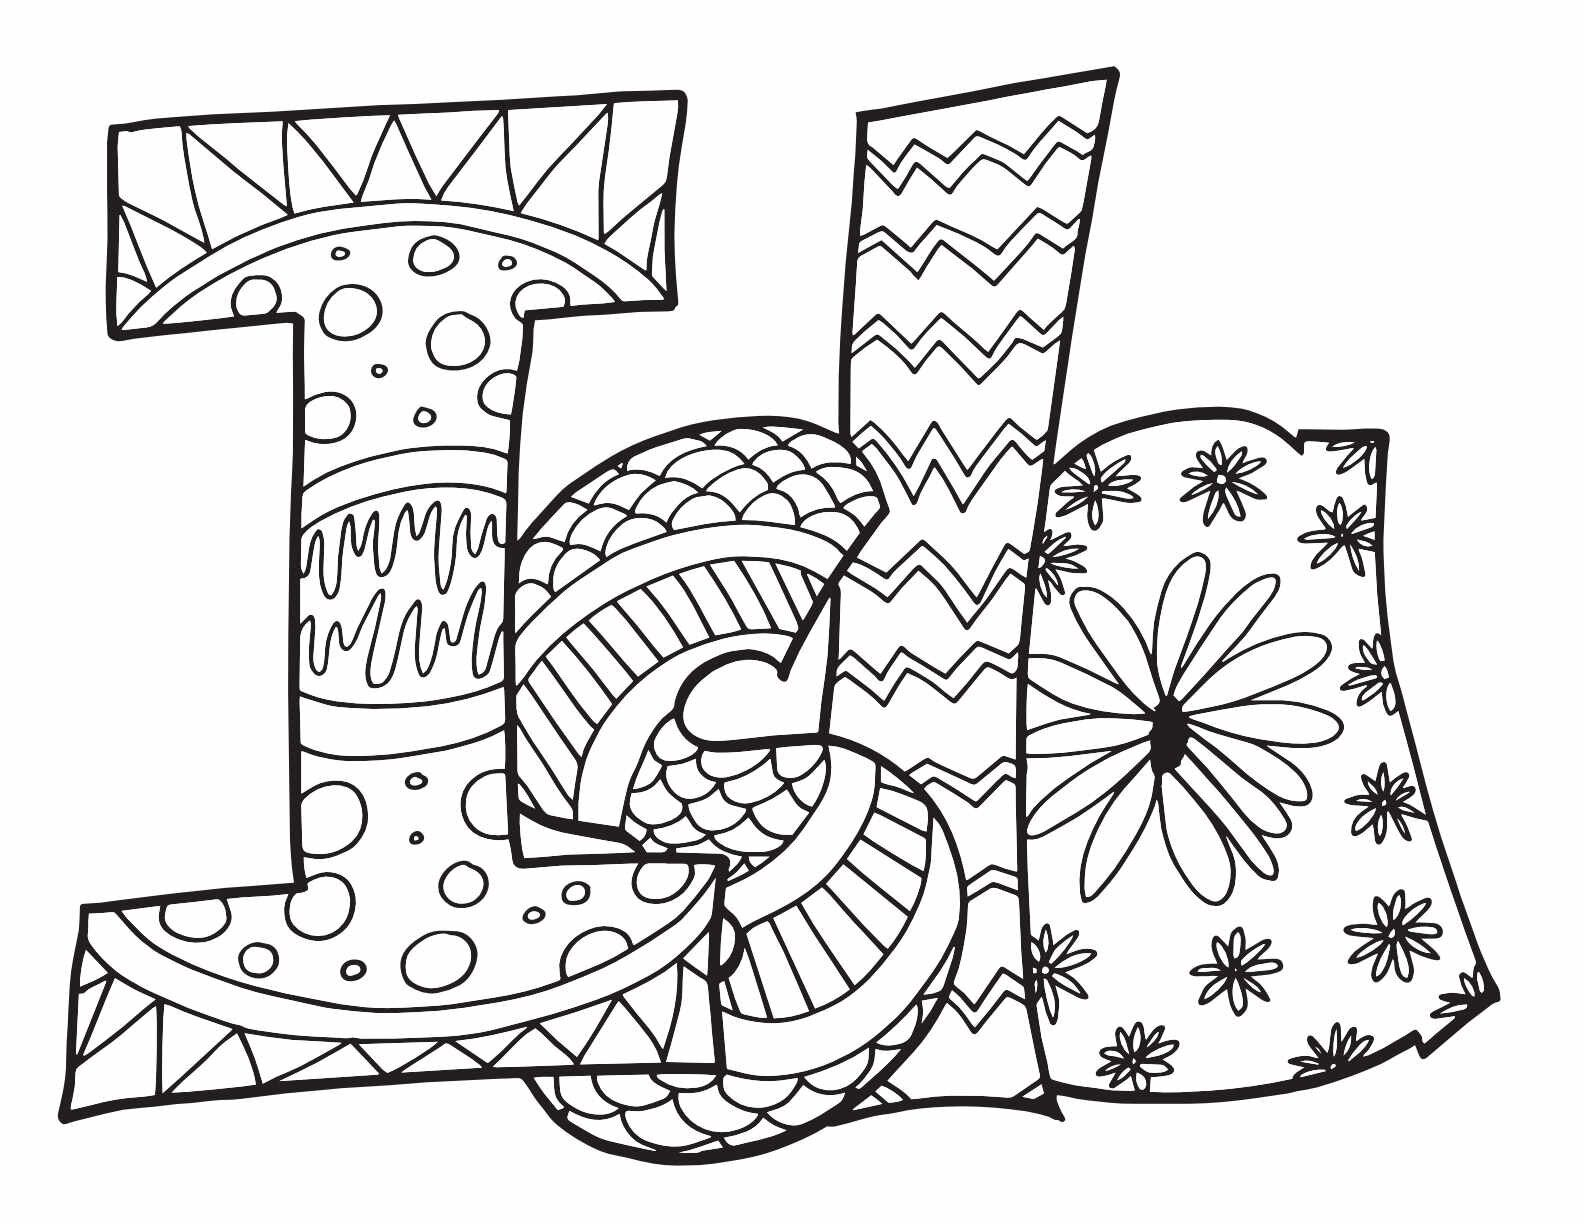 Isla Free Printable Coloring Page Stevie Doodles Free Printable Coloring Pages Free Printable Coloring Coloring Pages